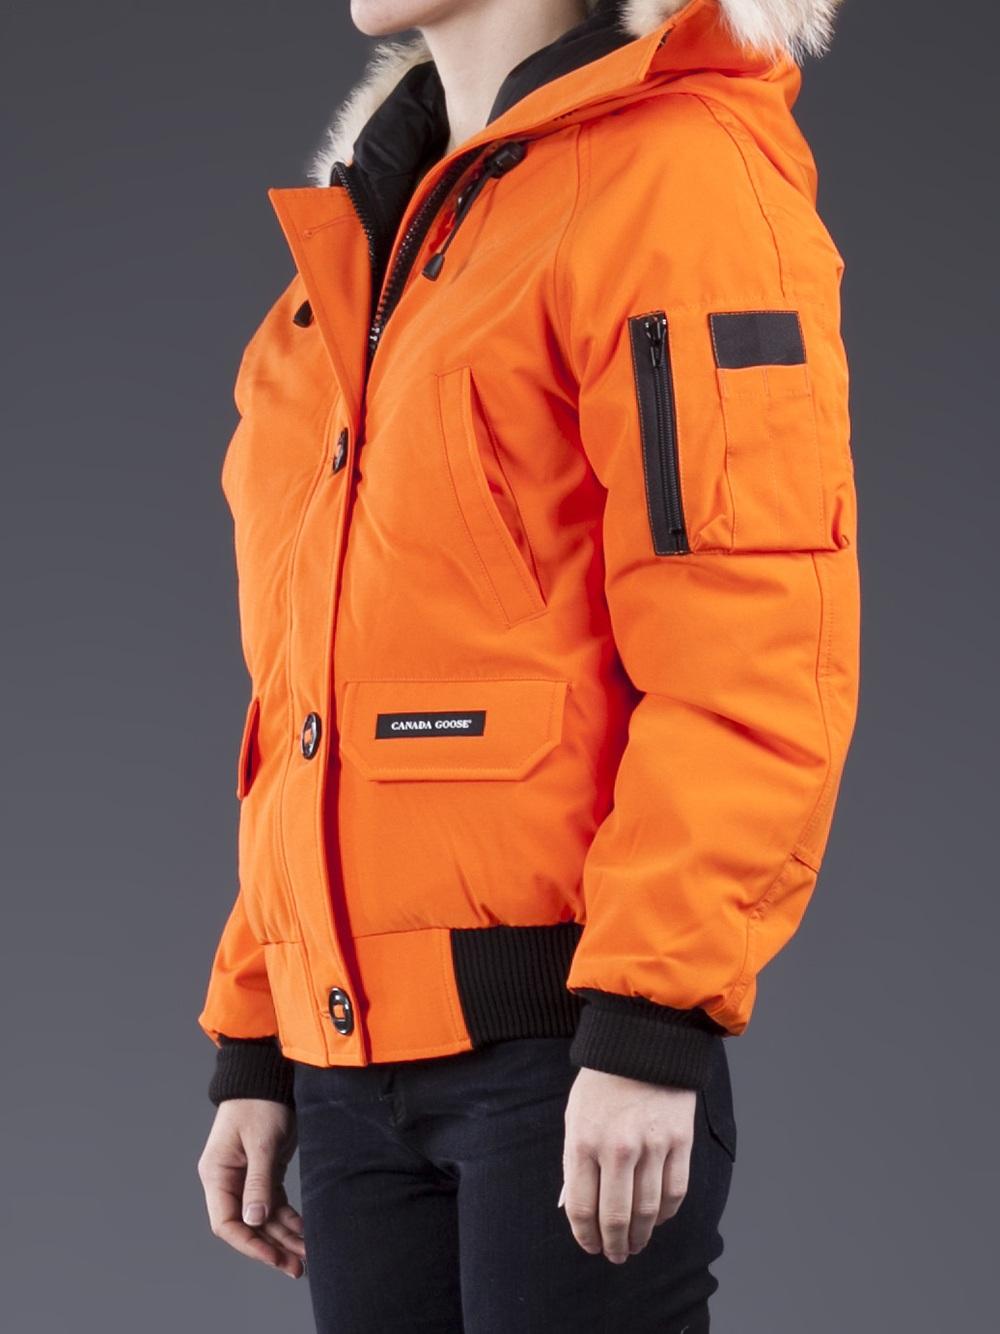 canada goose parka orange